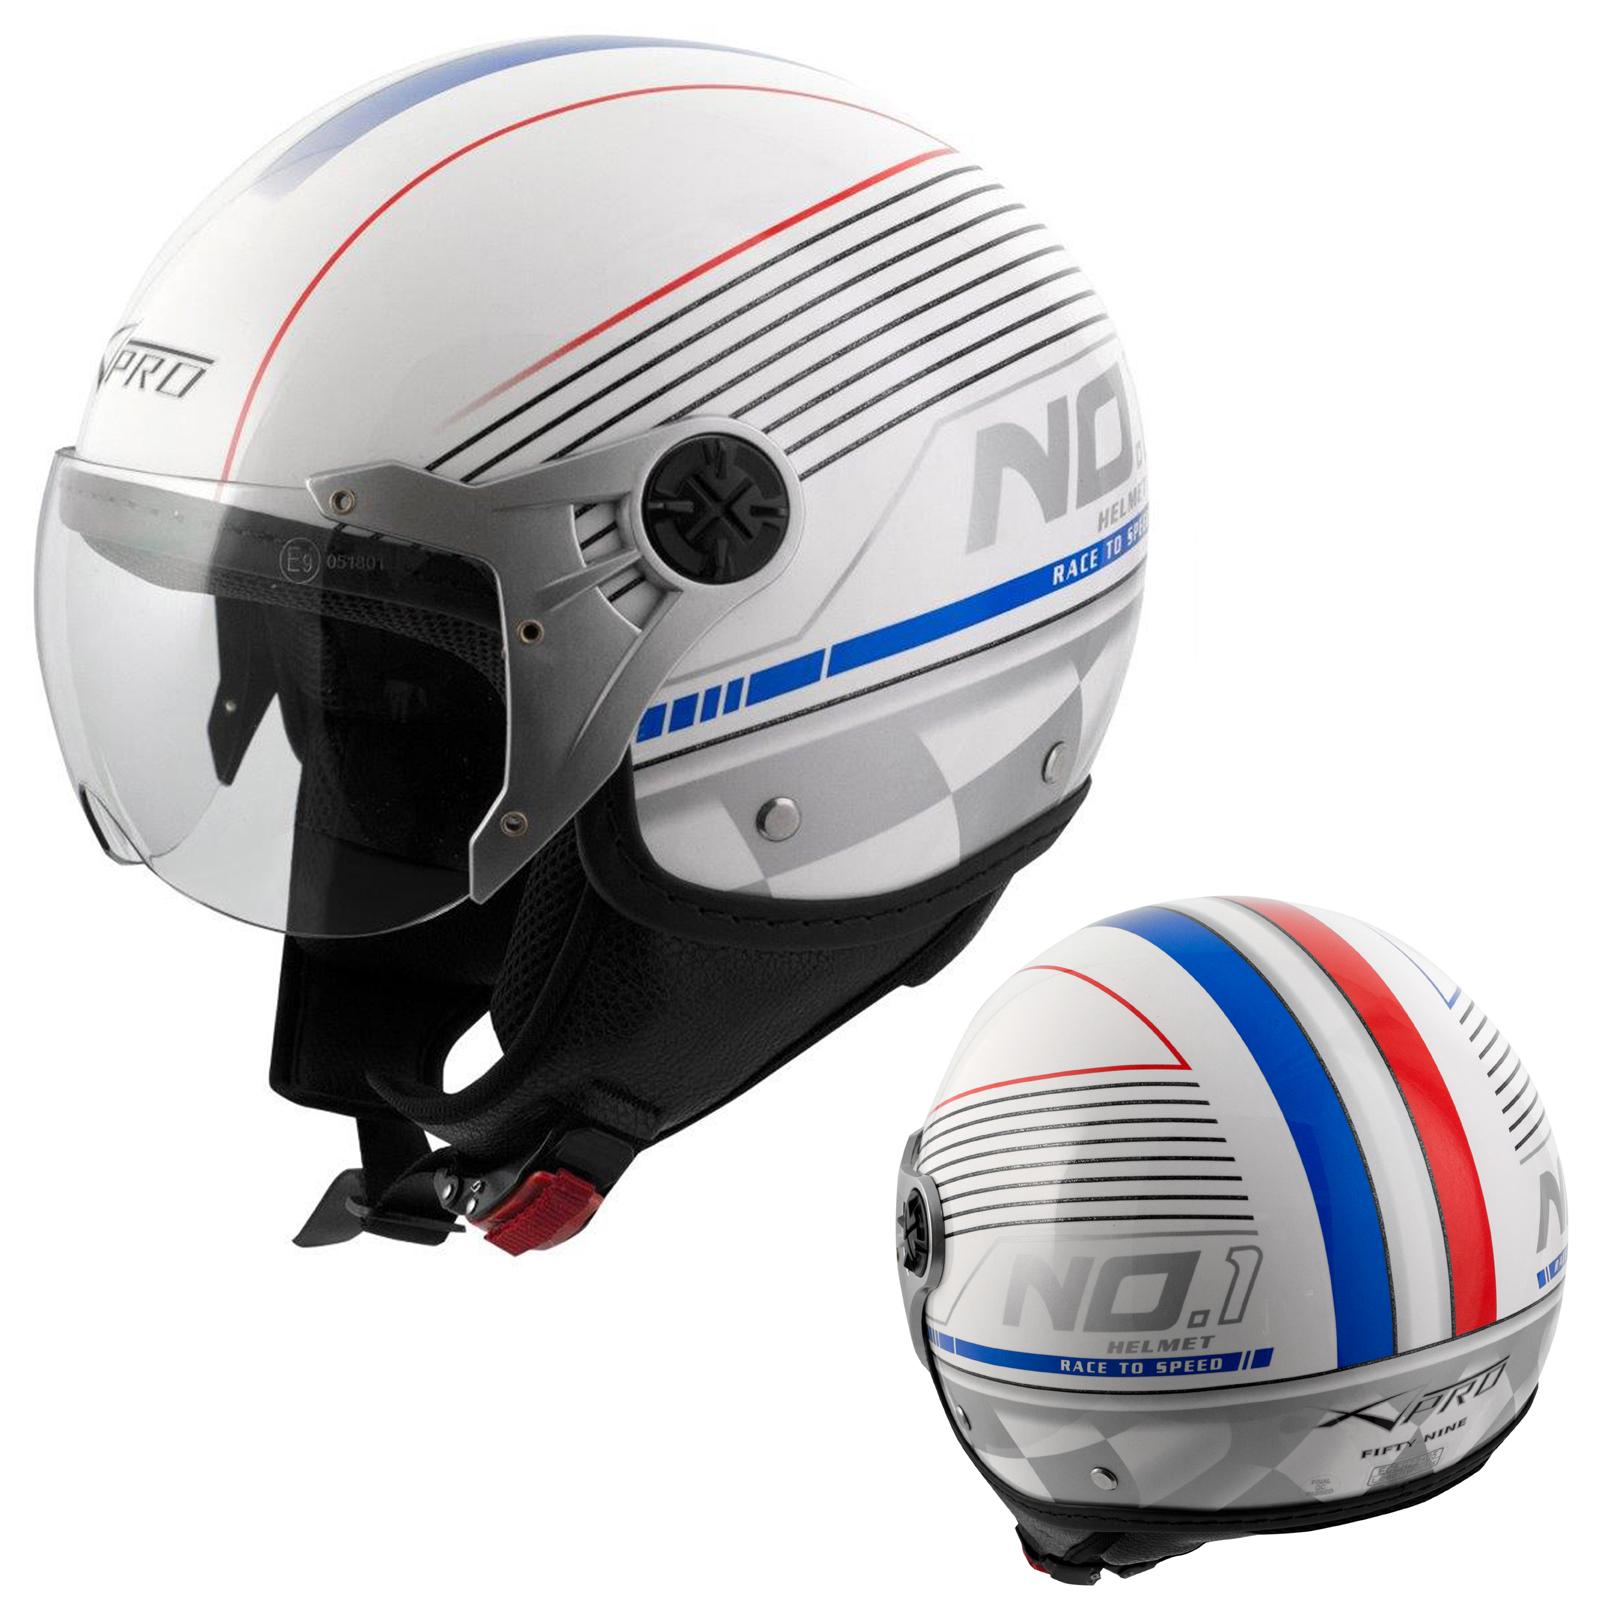 Casque moto ebay